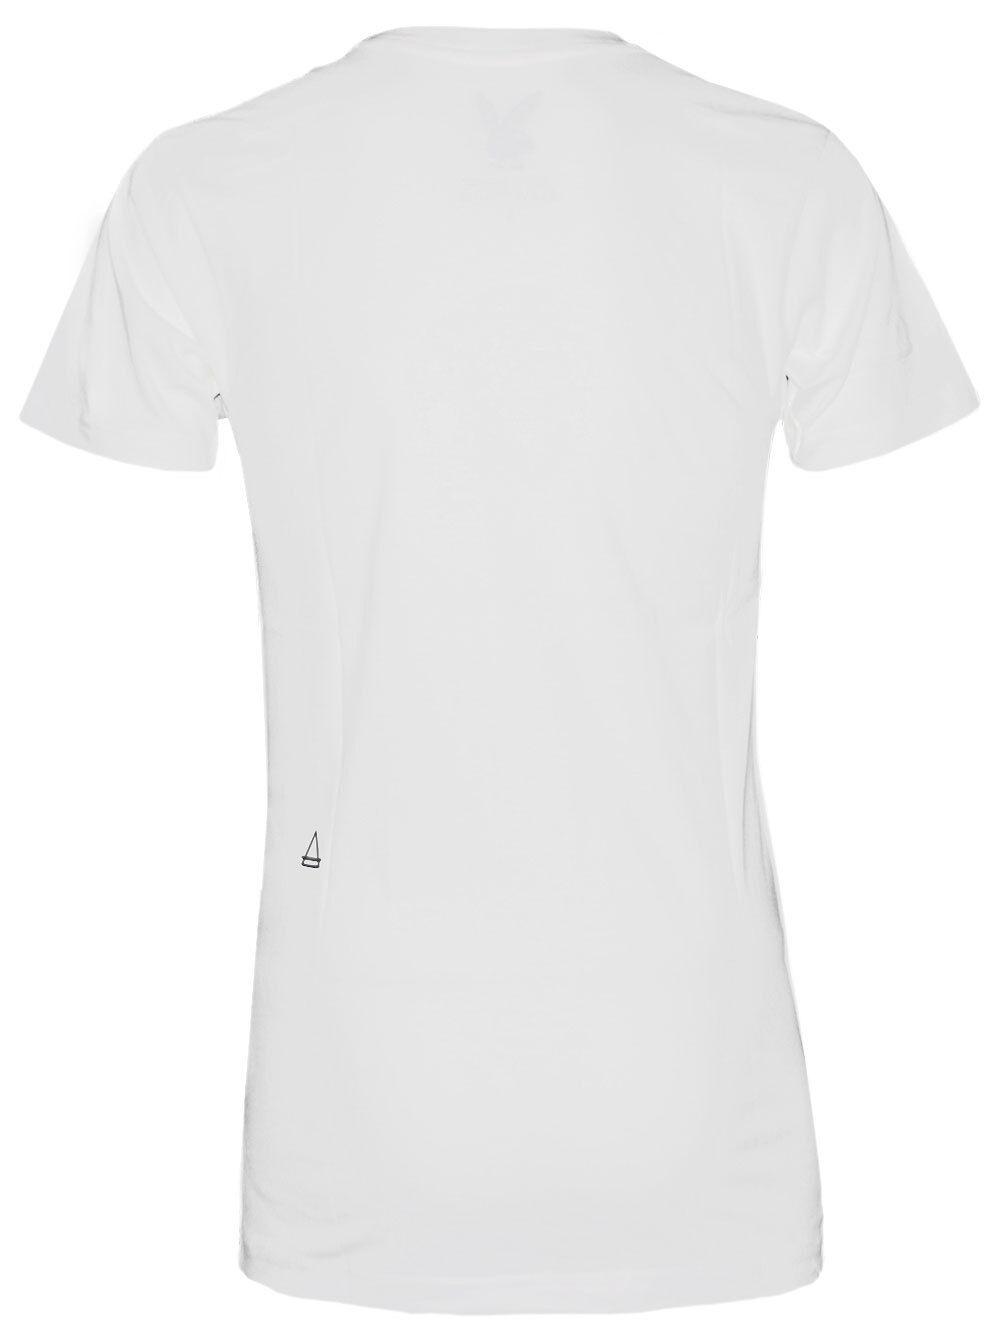 Undici Parigi Top Uomo Vneck T-Shirt Pb Church Bianco Bianco Bianco Nuovo + Conf. Orig. a03622